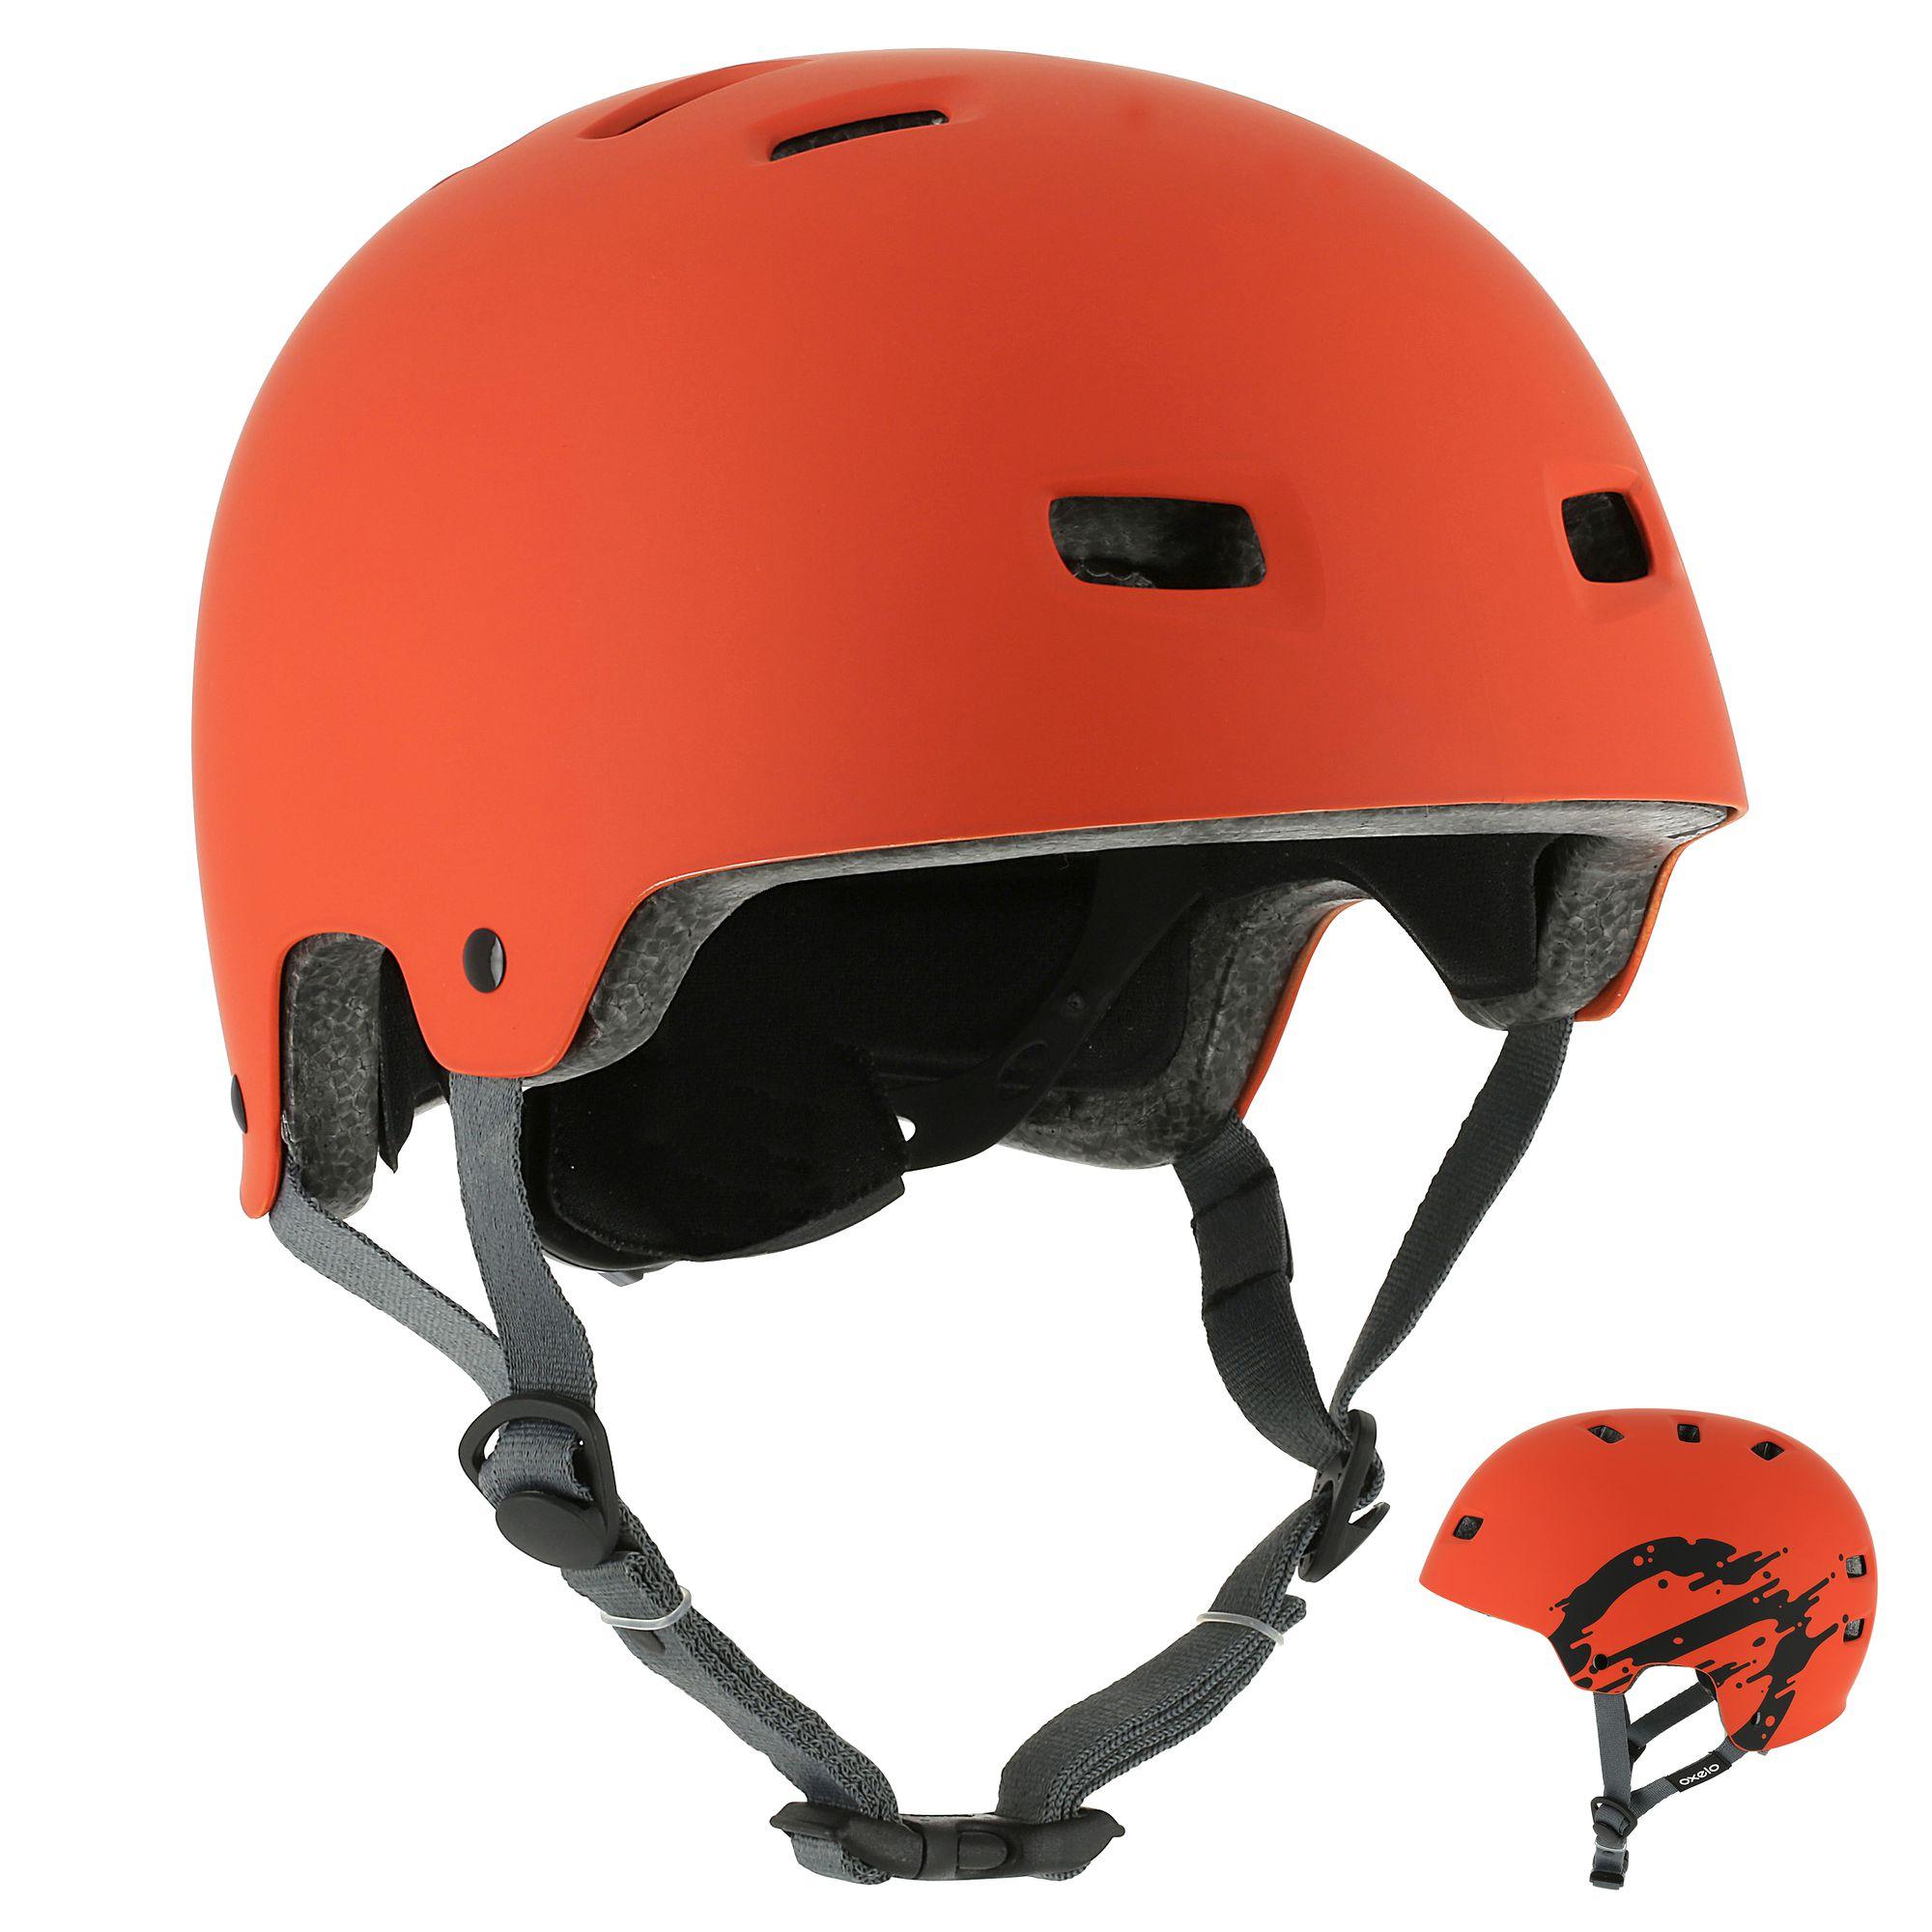 Casque roller skateboard trottinette vélo MF 7 orange